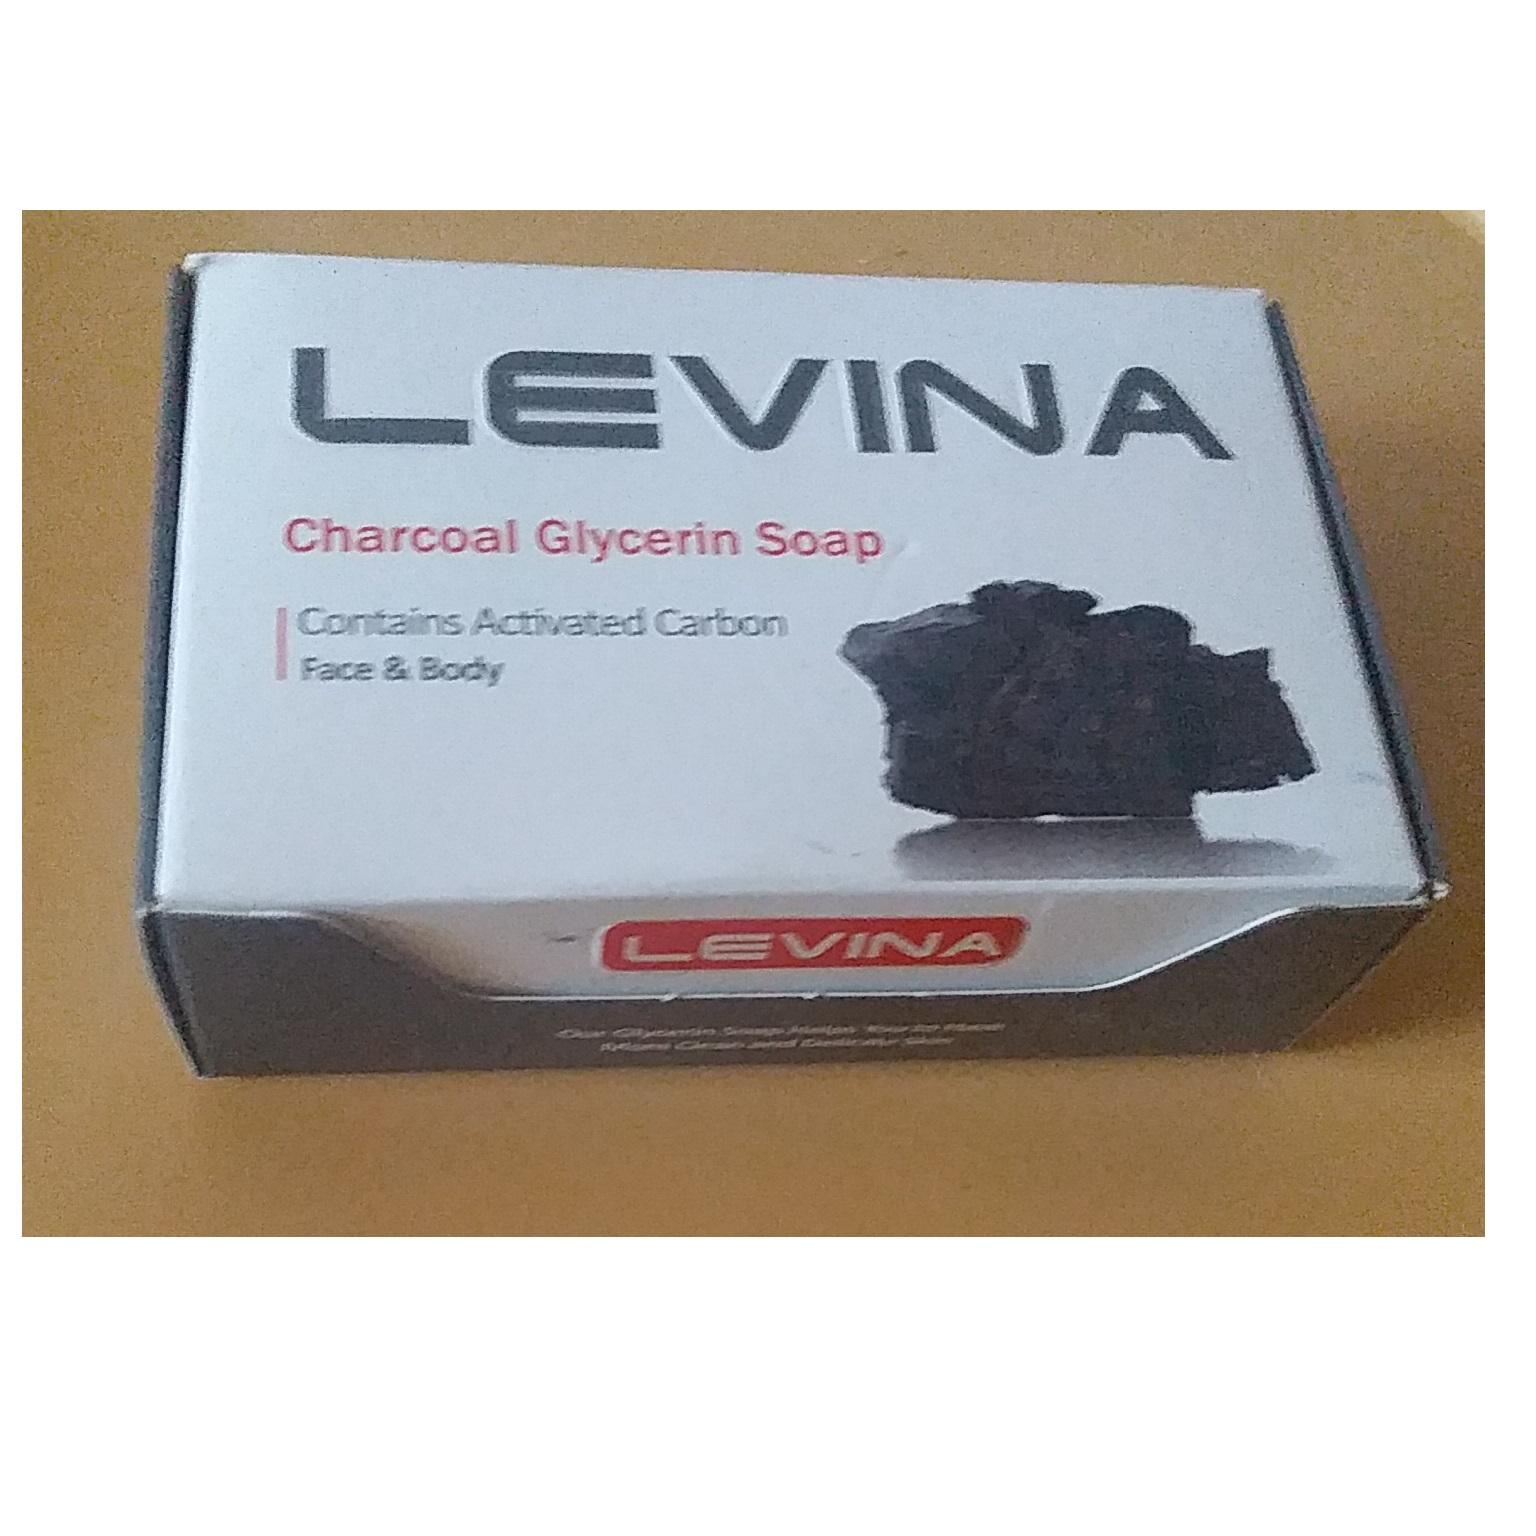 صابون گلیسیرینه ذغالی ۱۲۰ گرم حاوی کربن فعال